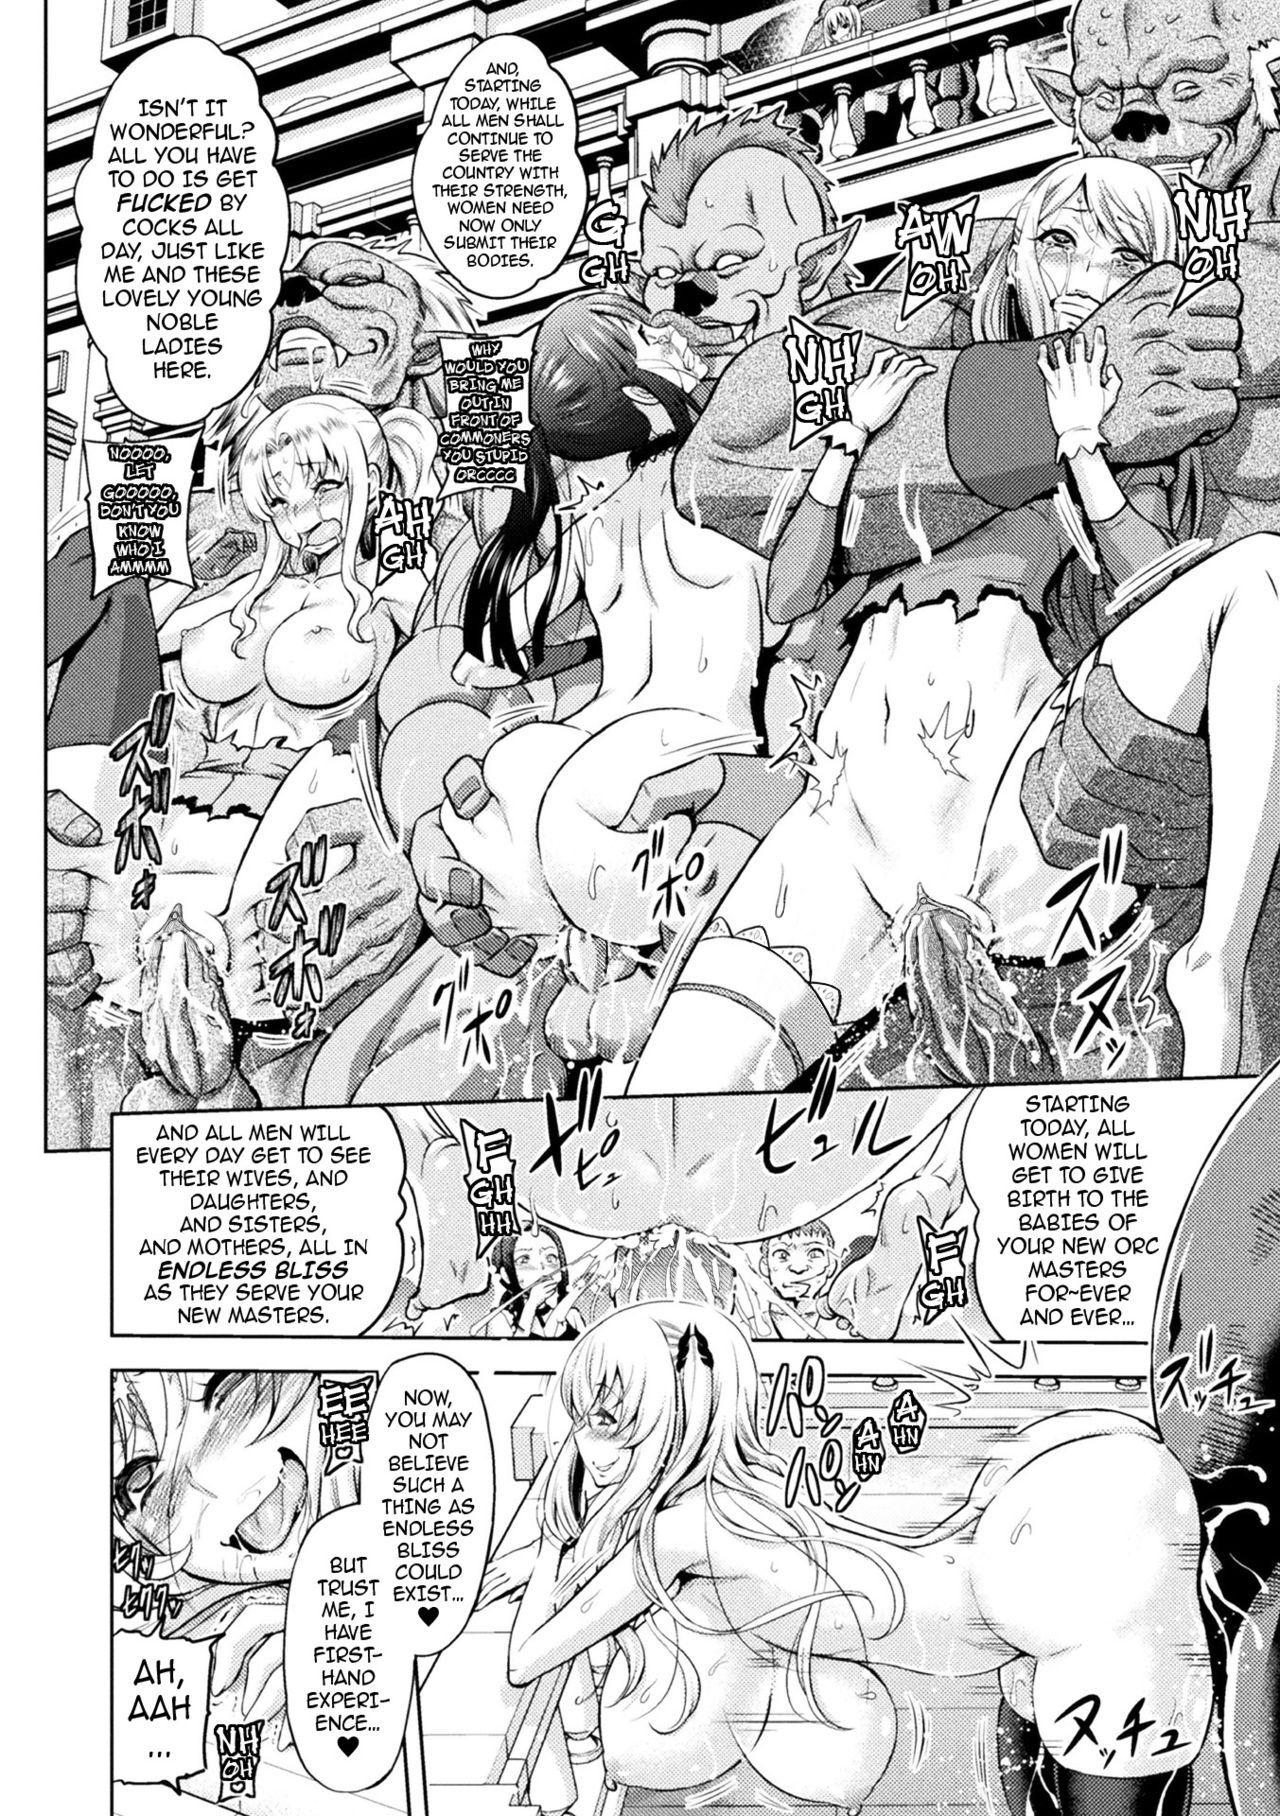 [Yamada Gogogo] Erona ~Orc no Inmon ni Okasareta Onna Kishi no Matsuro~ | Erona ~The Fall of a Beautiful Knight Cursed with the Lewd Mark of an Orc~ Ch. 1-6 [English] [darknight] [Decensored] [ongoing] 101